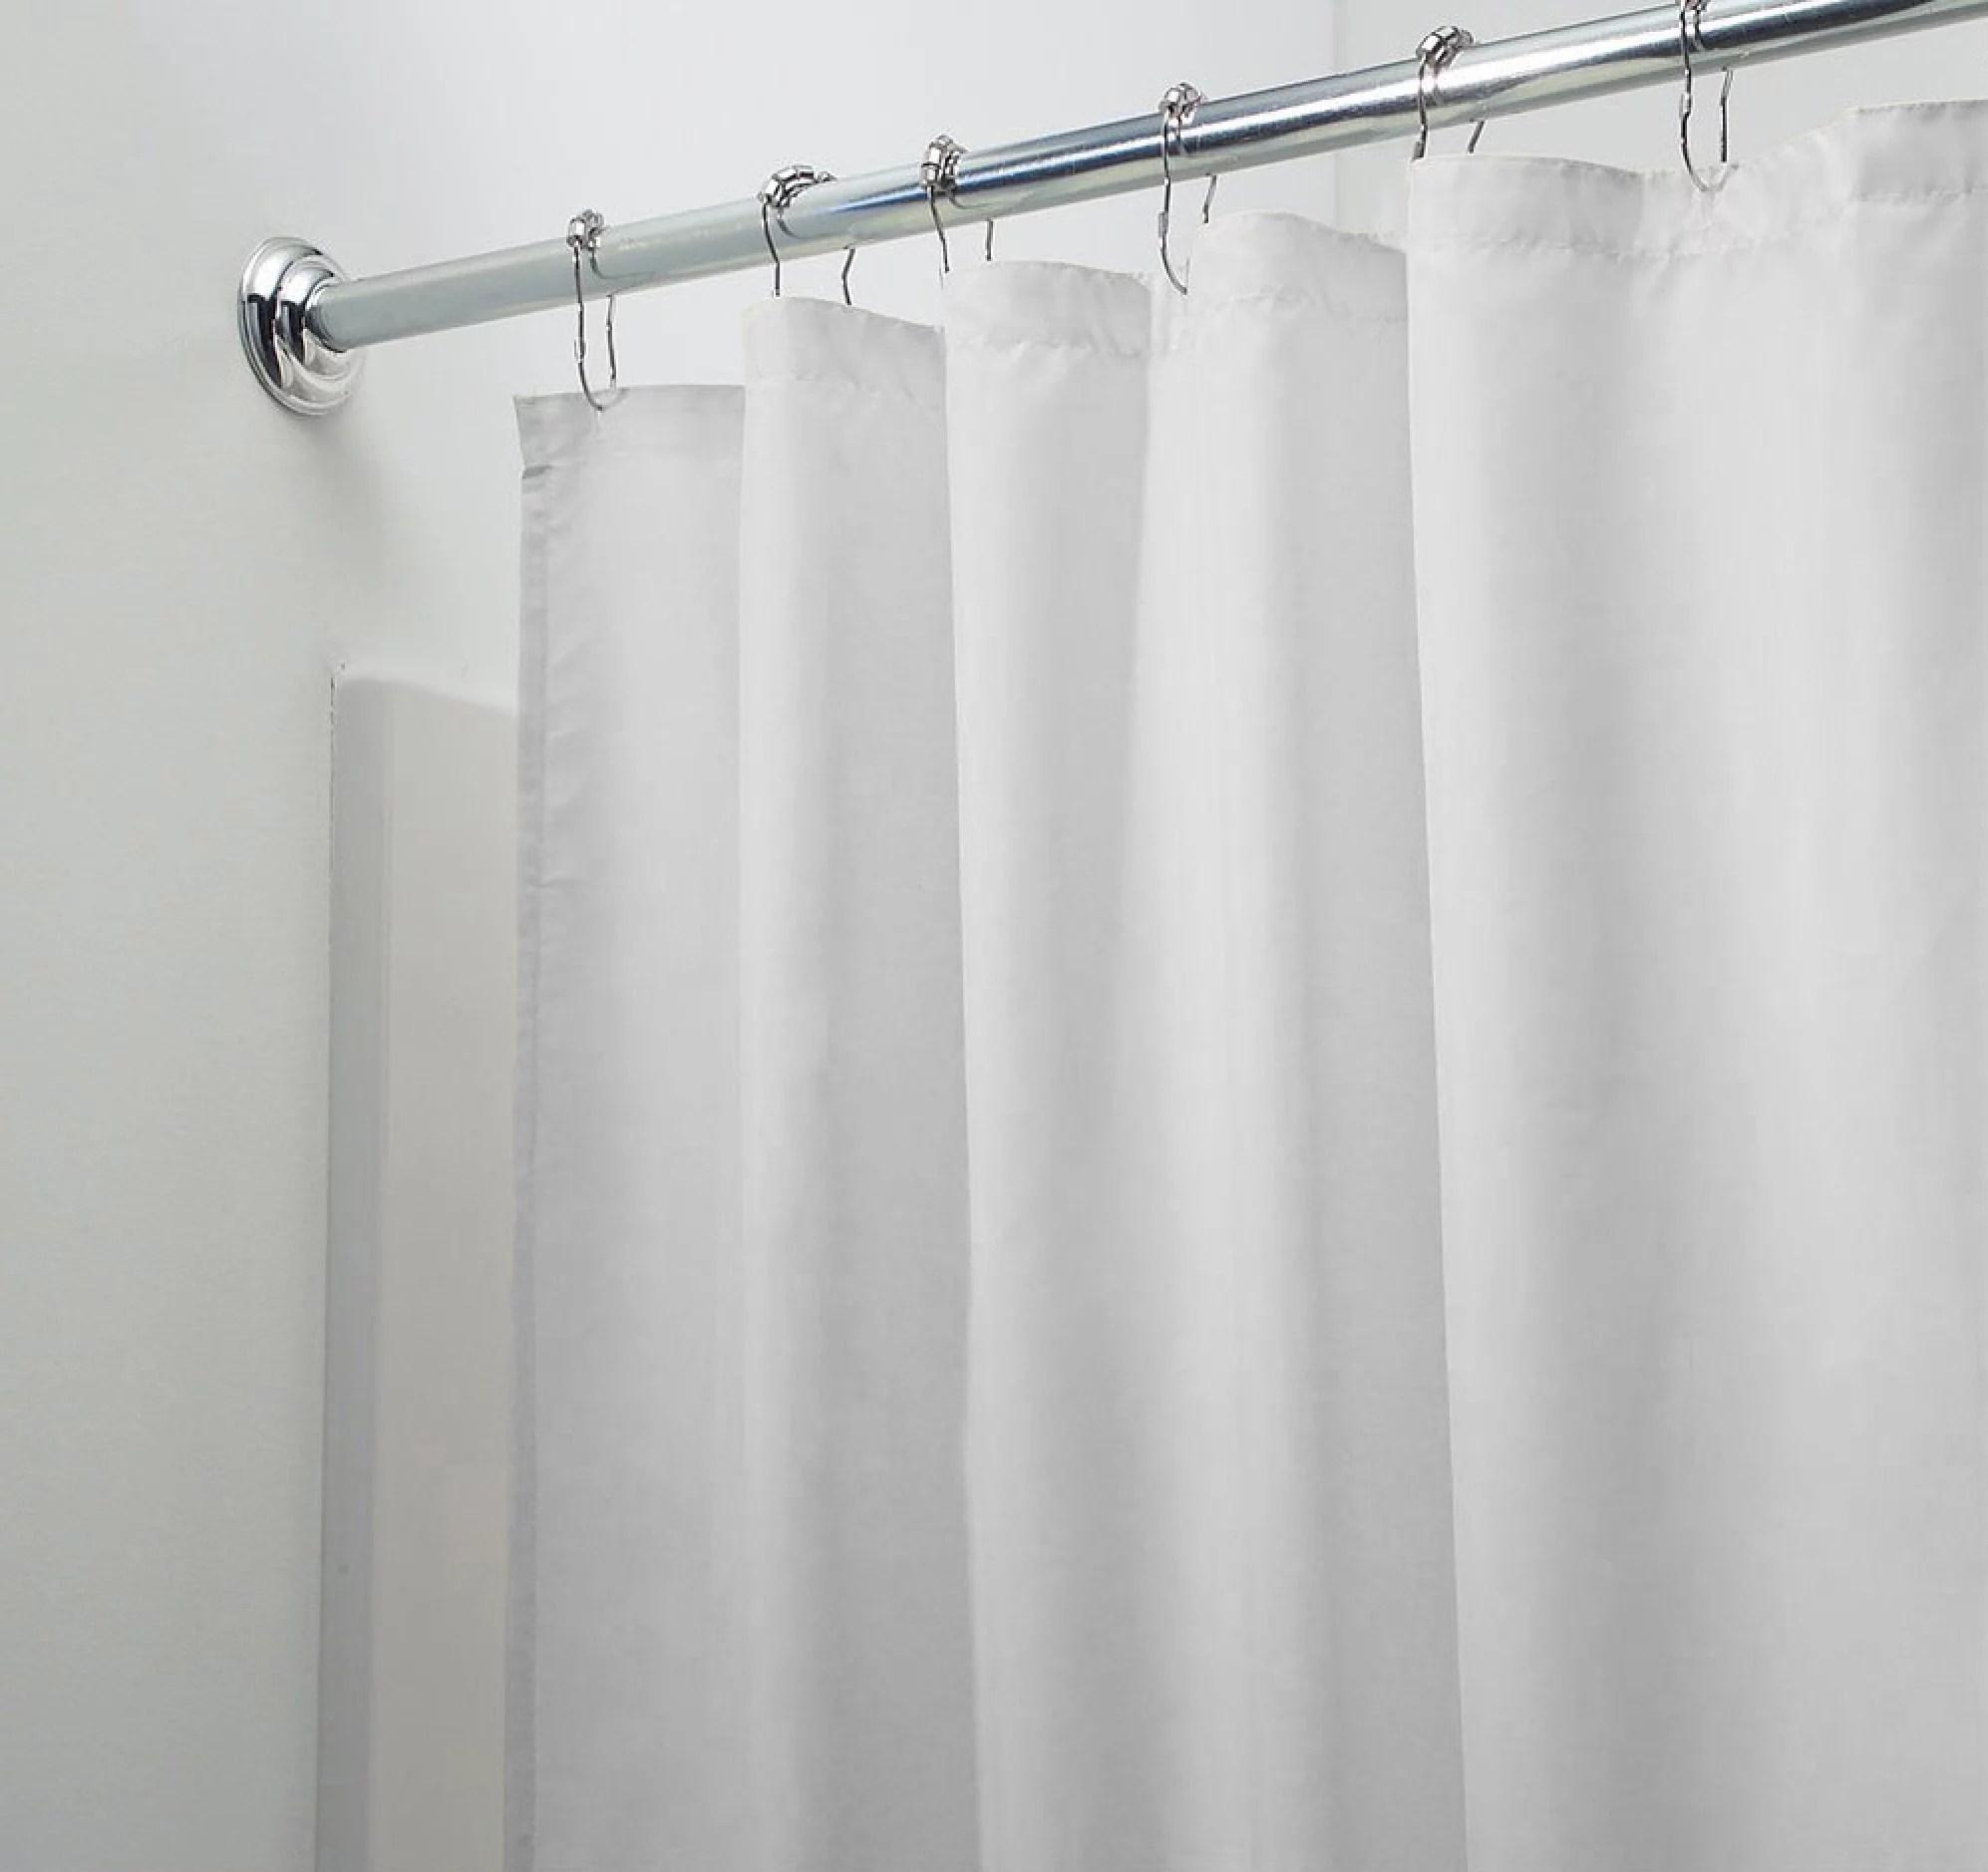 mold mildew resistant fabric shower curtain liner white walmart com